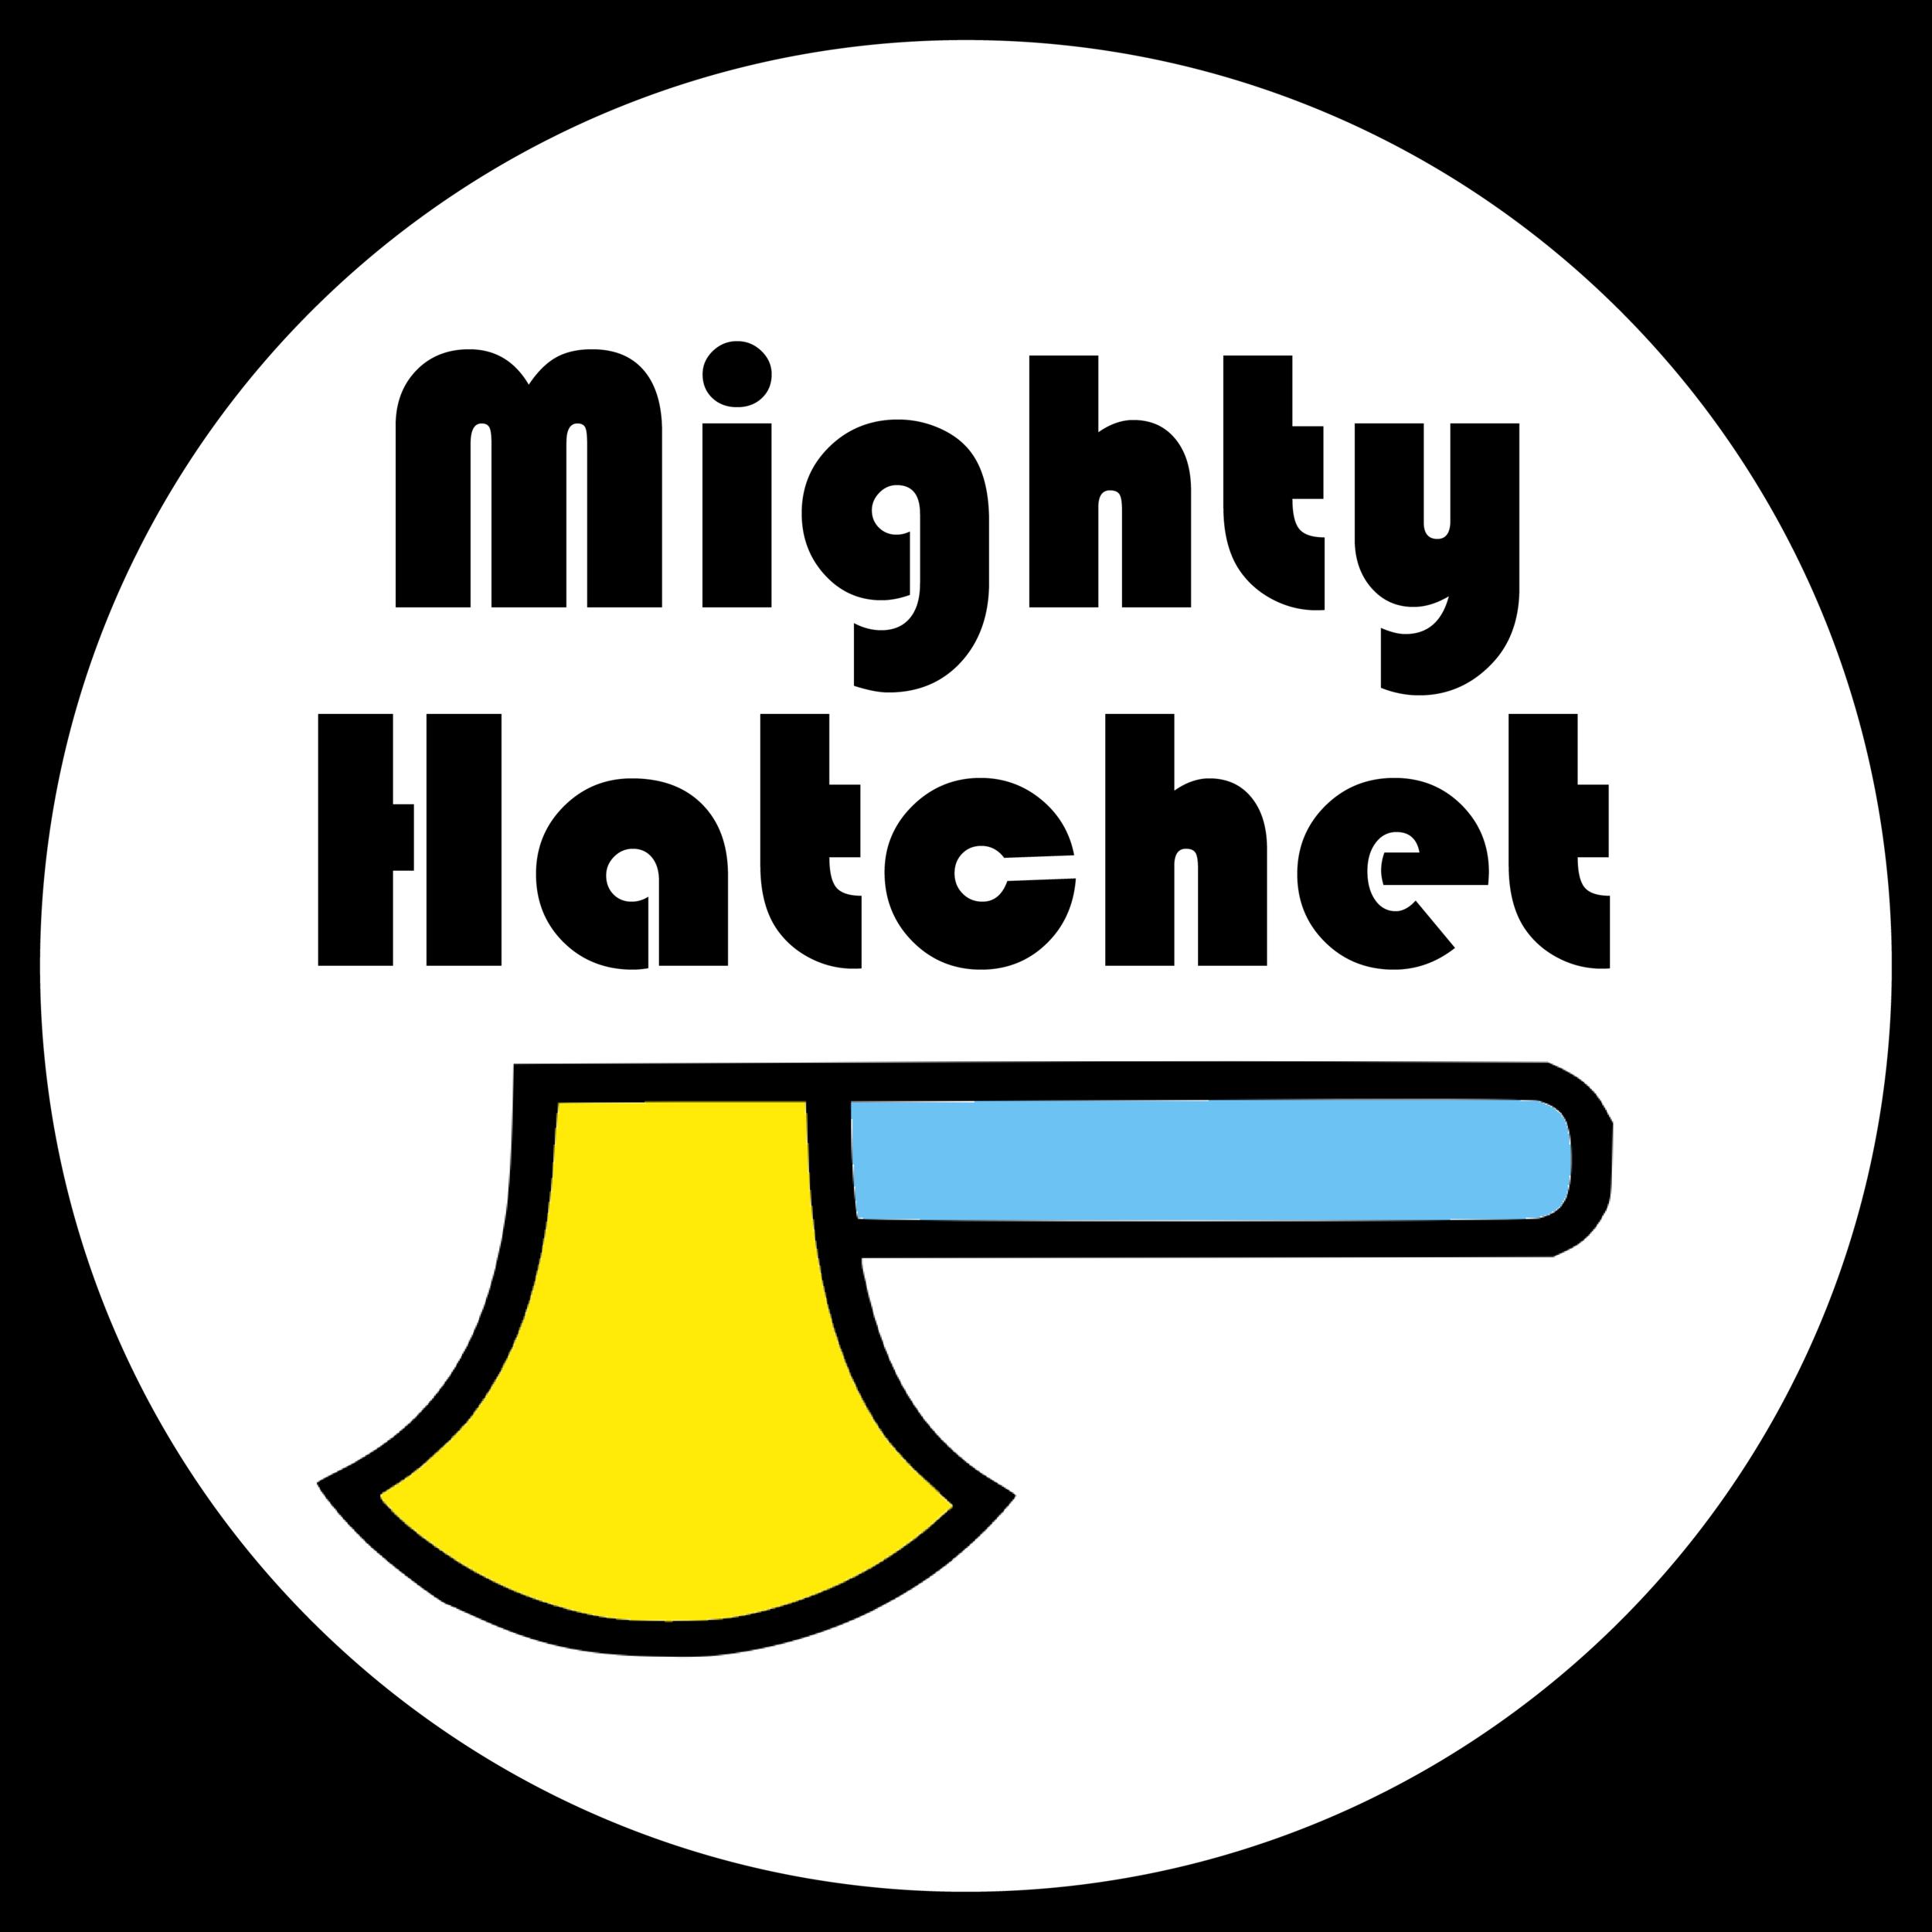 mighty hatchet Logo white circle.png